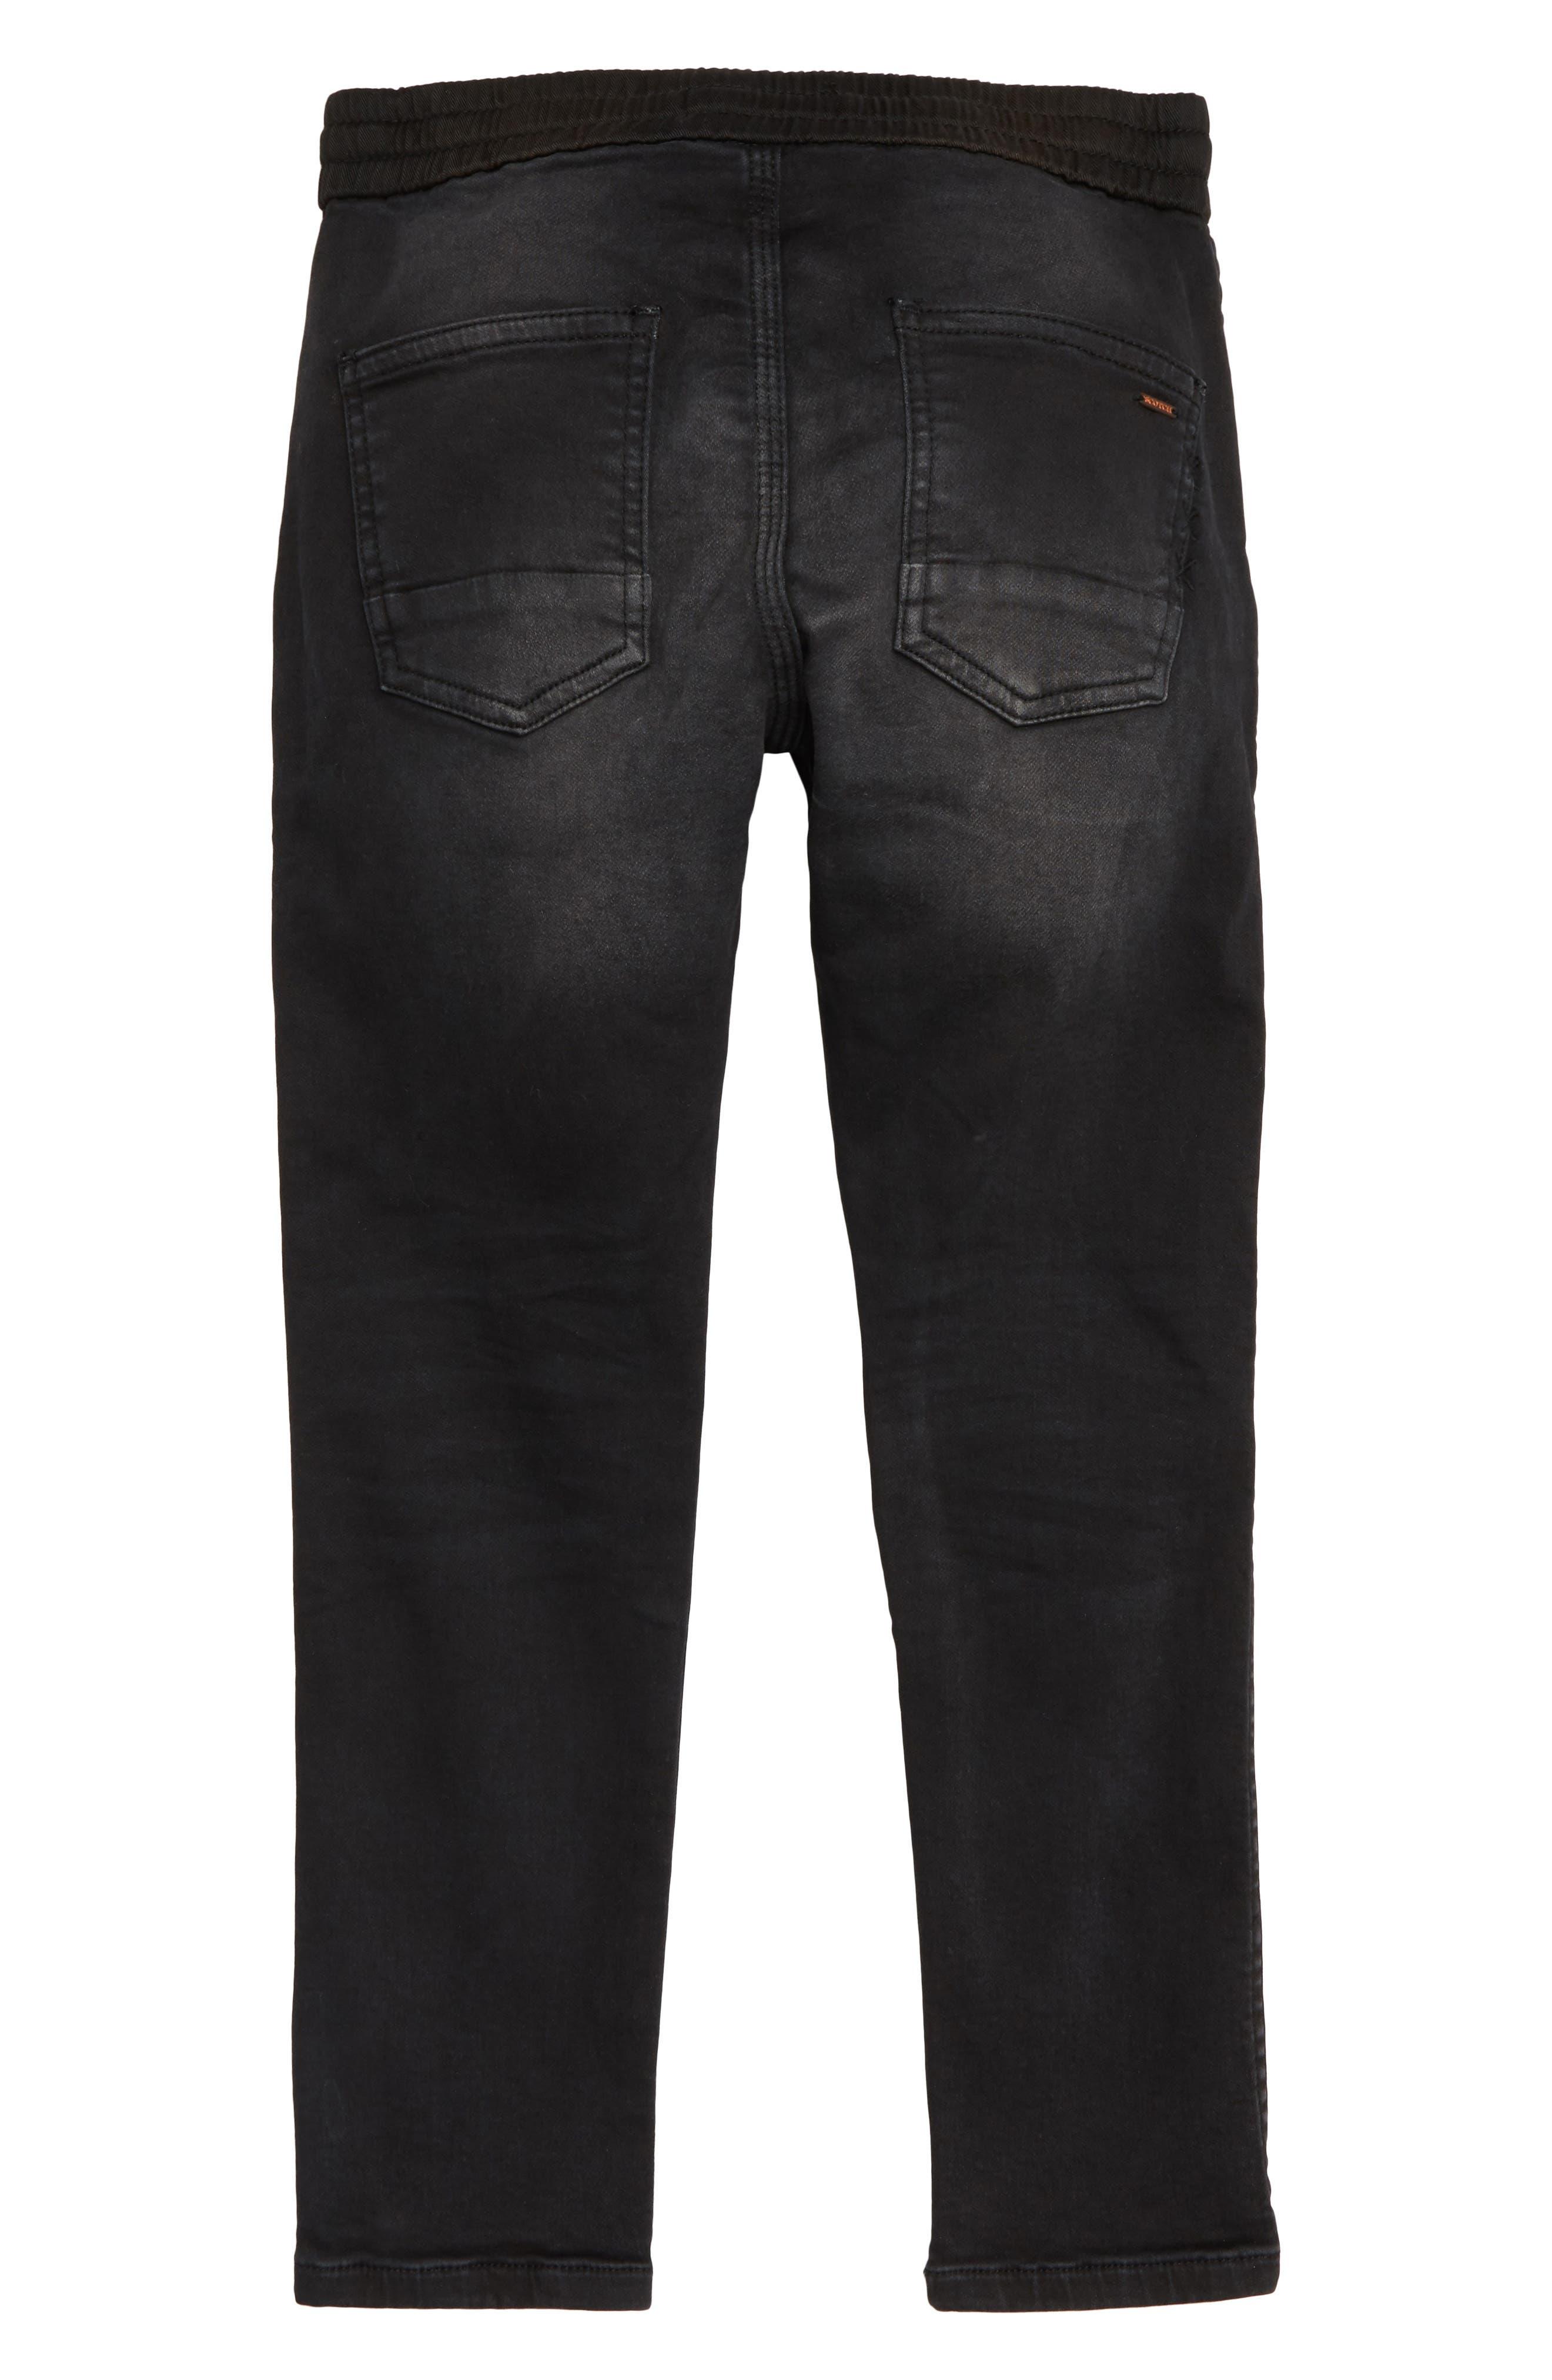 Slim Pull-On Pants,                             Alternate thumbnail 2, color,                             001